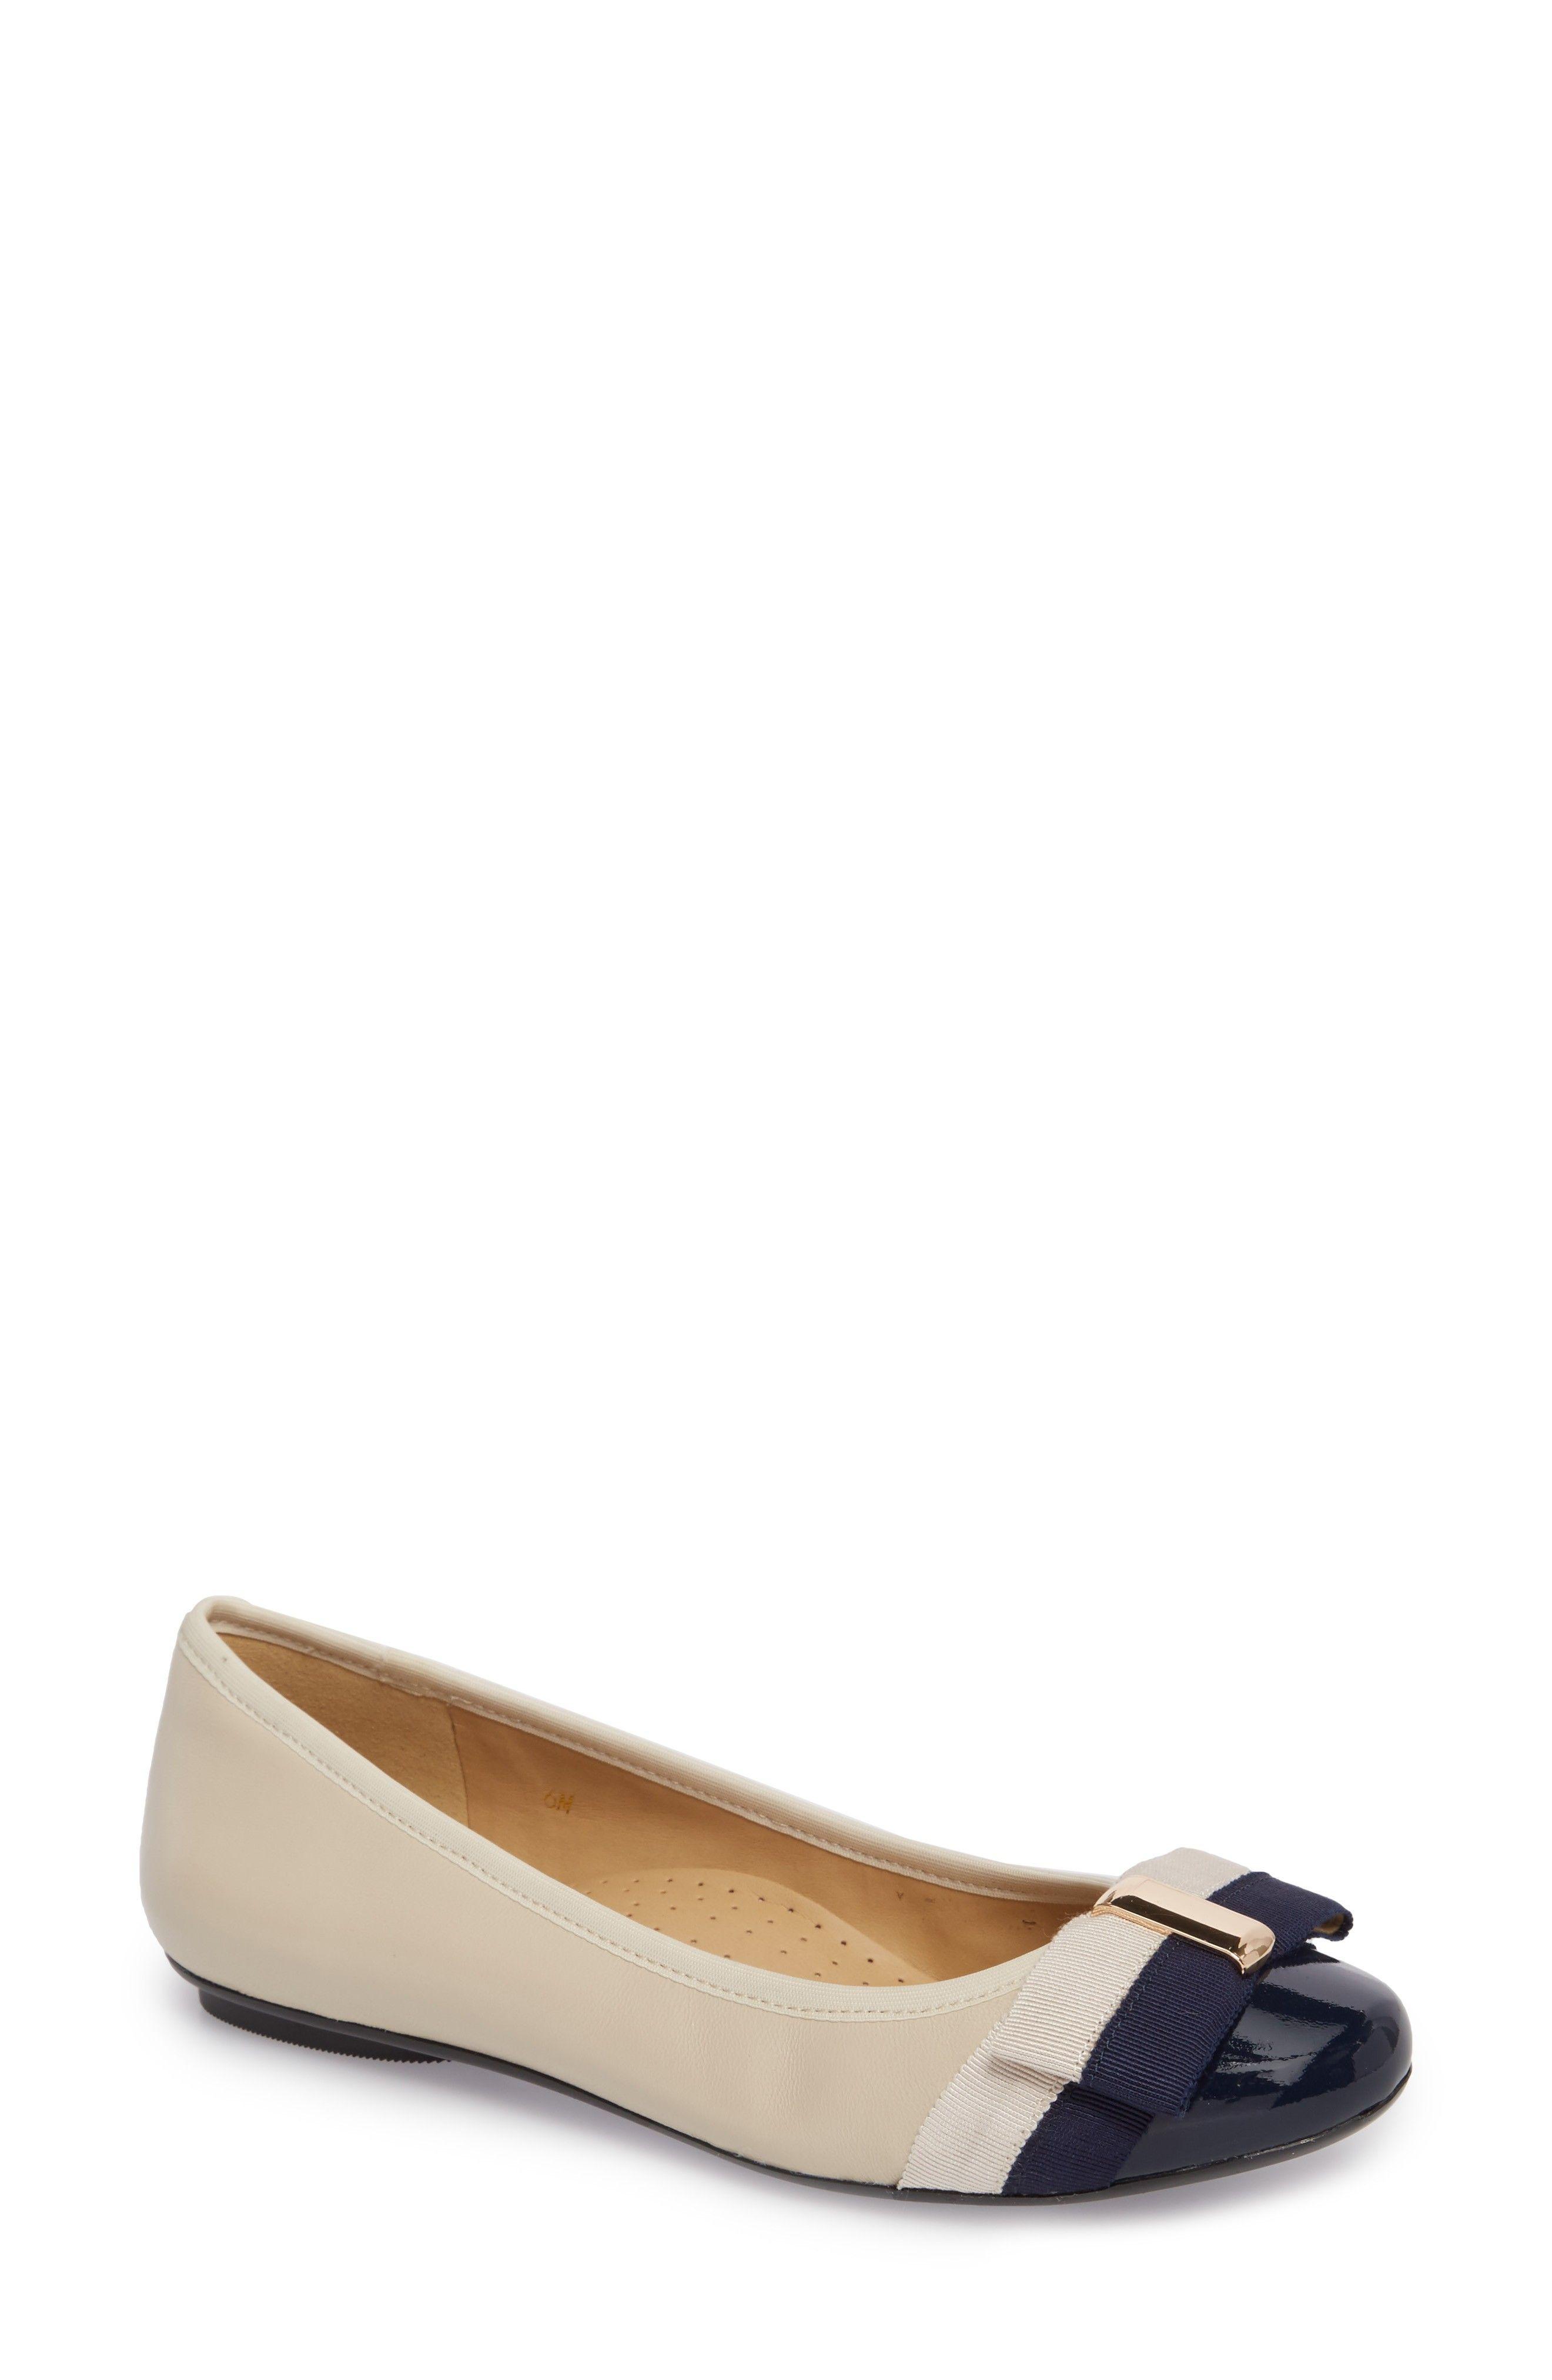 00ddd824ecec Buy VANELI Salia Bow Flat online. New VANELI Shoes.   134.95  SKU  HIMM53696PSQG43542